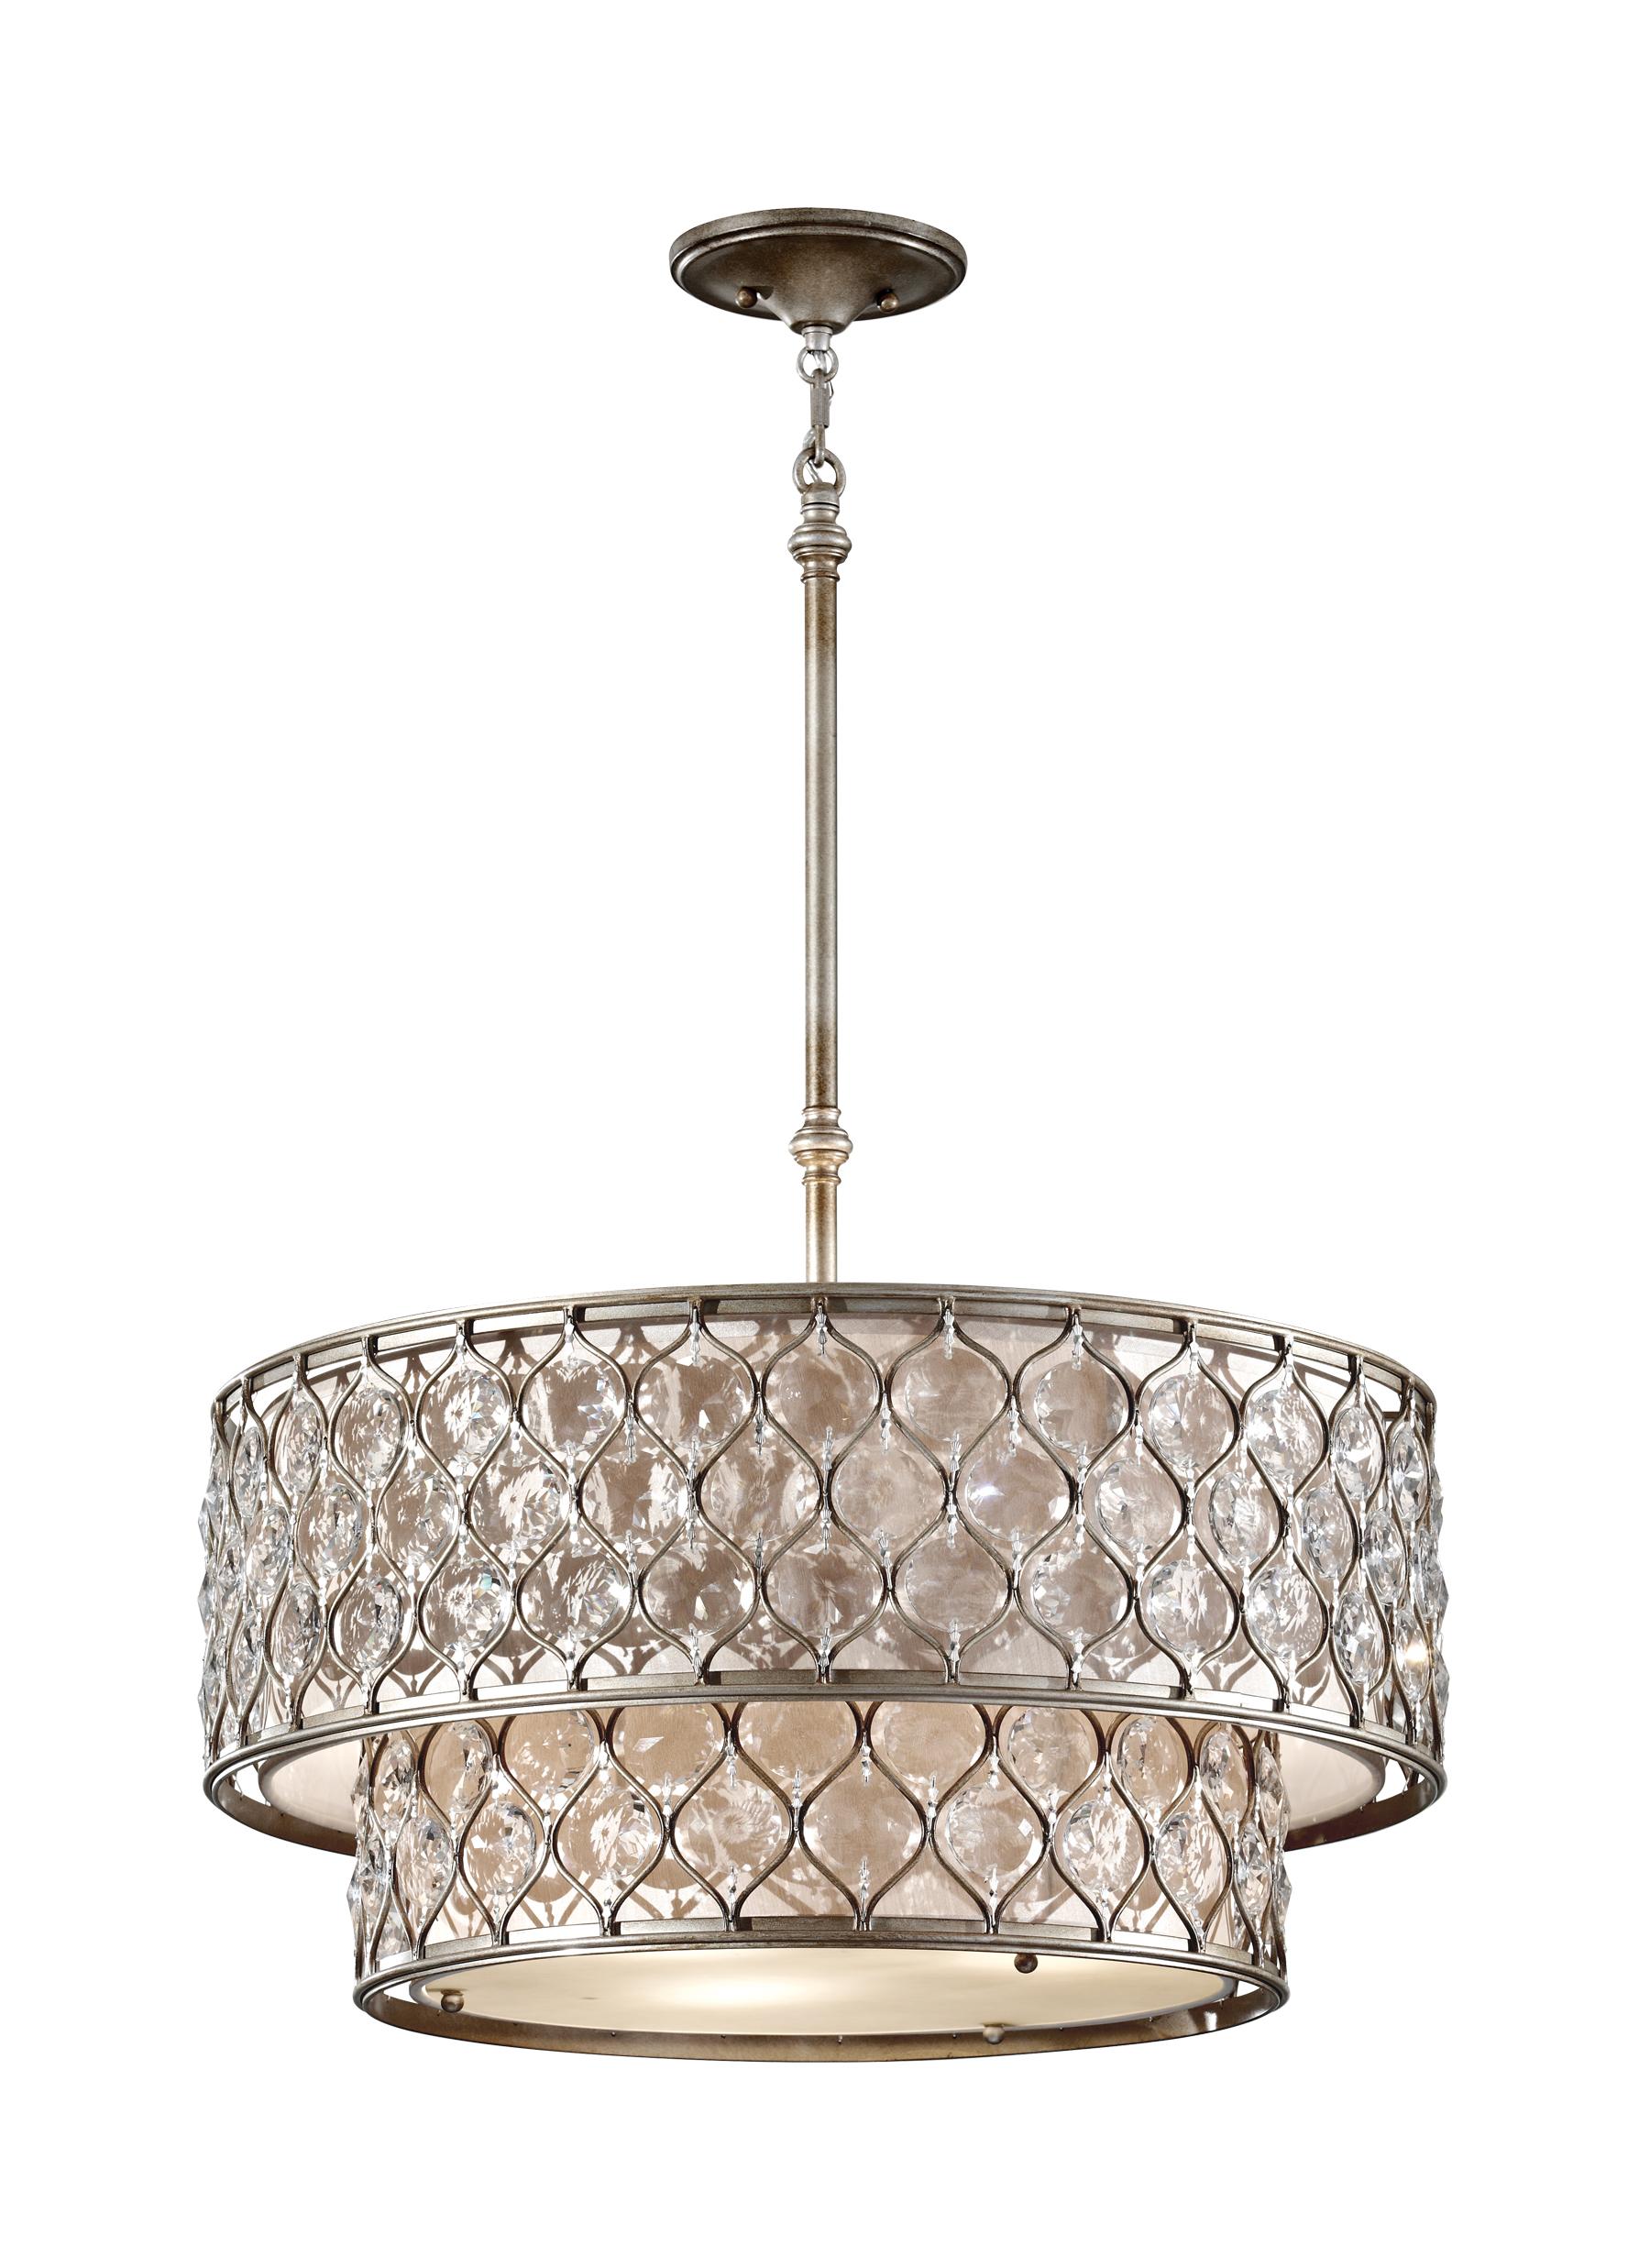 wall mini chandelier dining solaris unique for flush lights lighting ideas c chandeliers room sconces sconce luxury mount interior crystorama glass ashton elegant